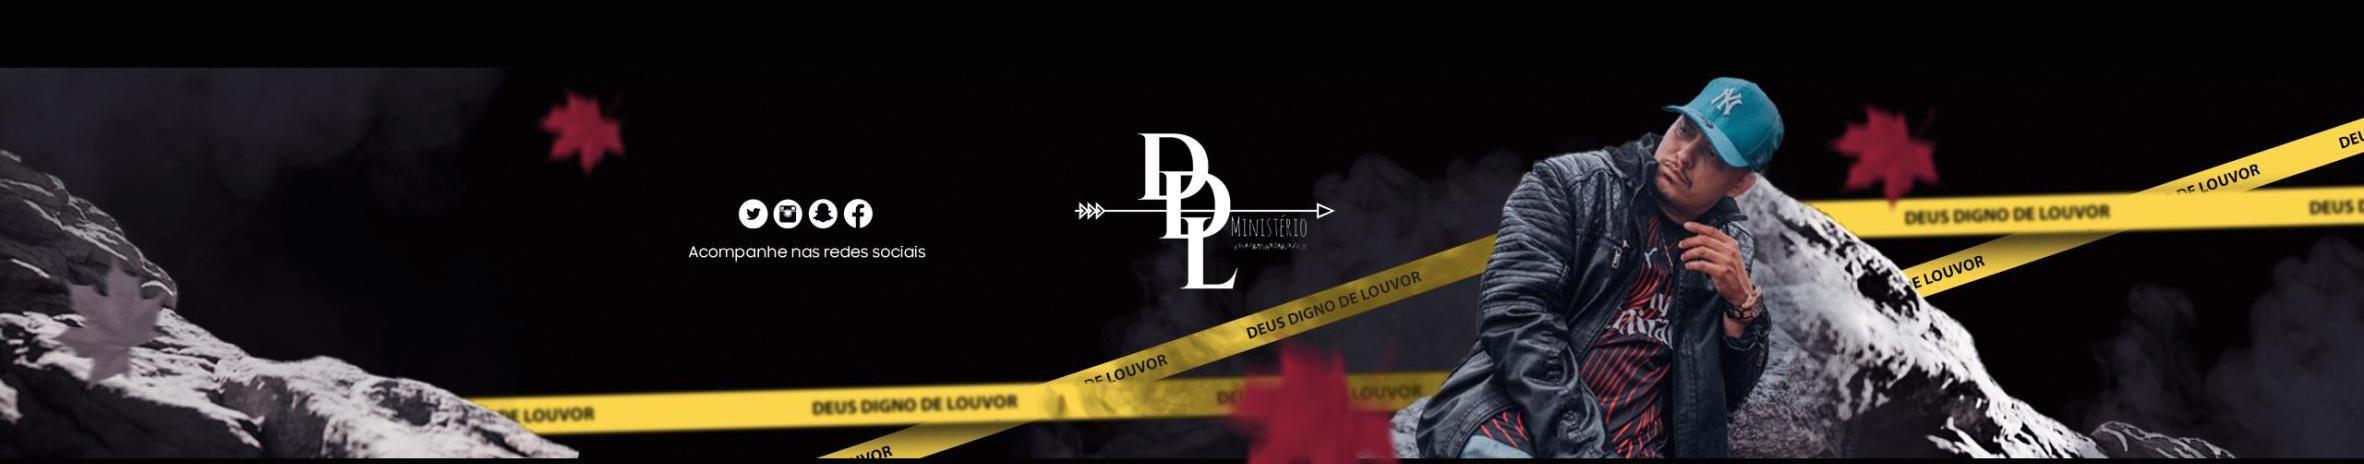 Imagem de capa de DDL -DEUS DIGNO DE LOUVOR